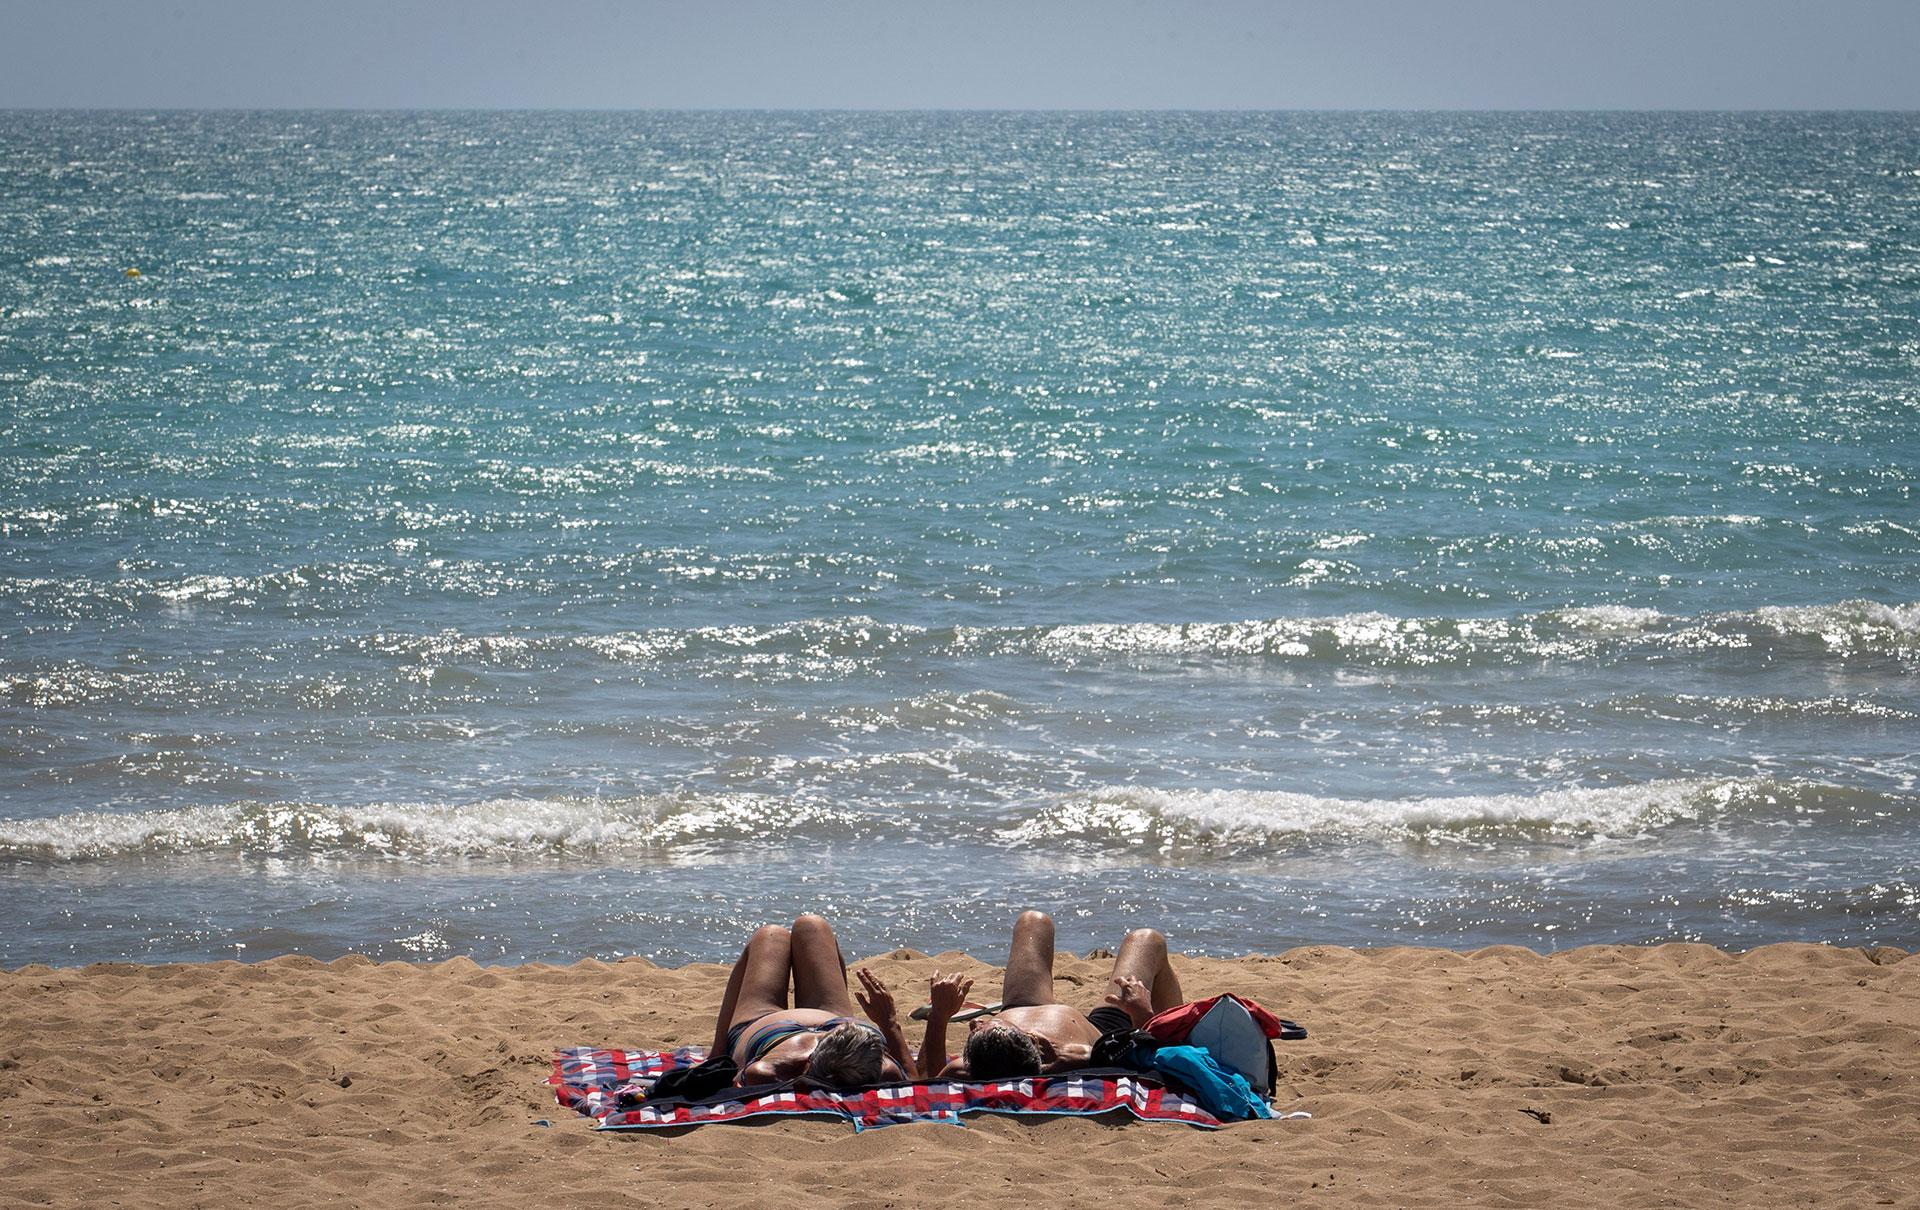 Dos turistas tomando solo en la playa de Palma de Mallorca.